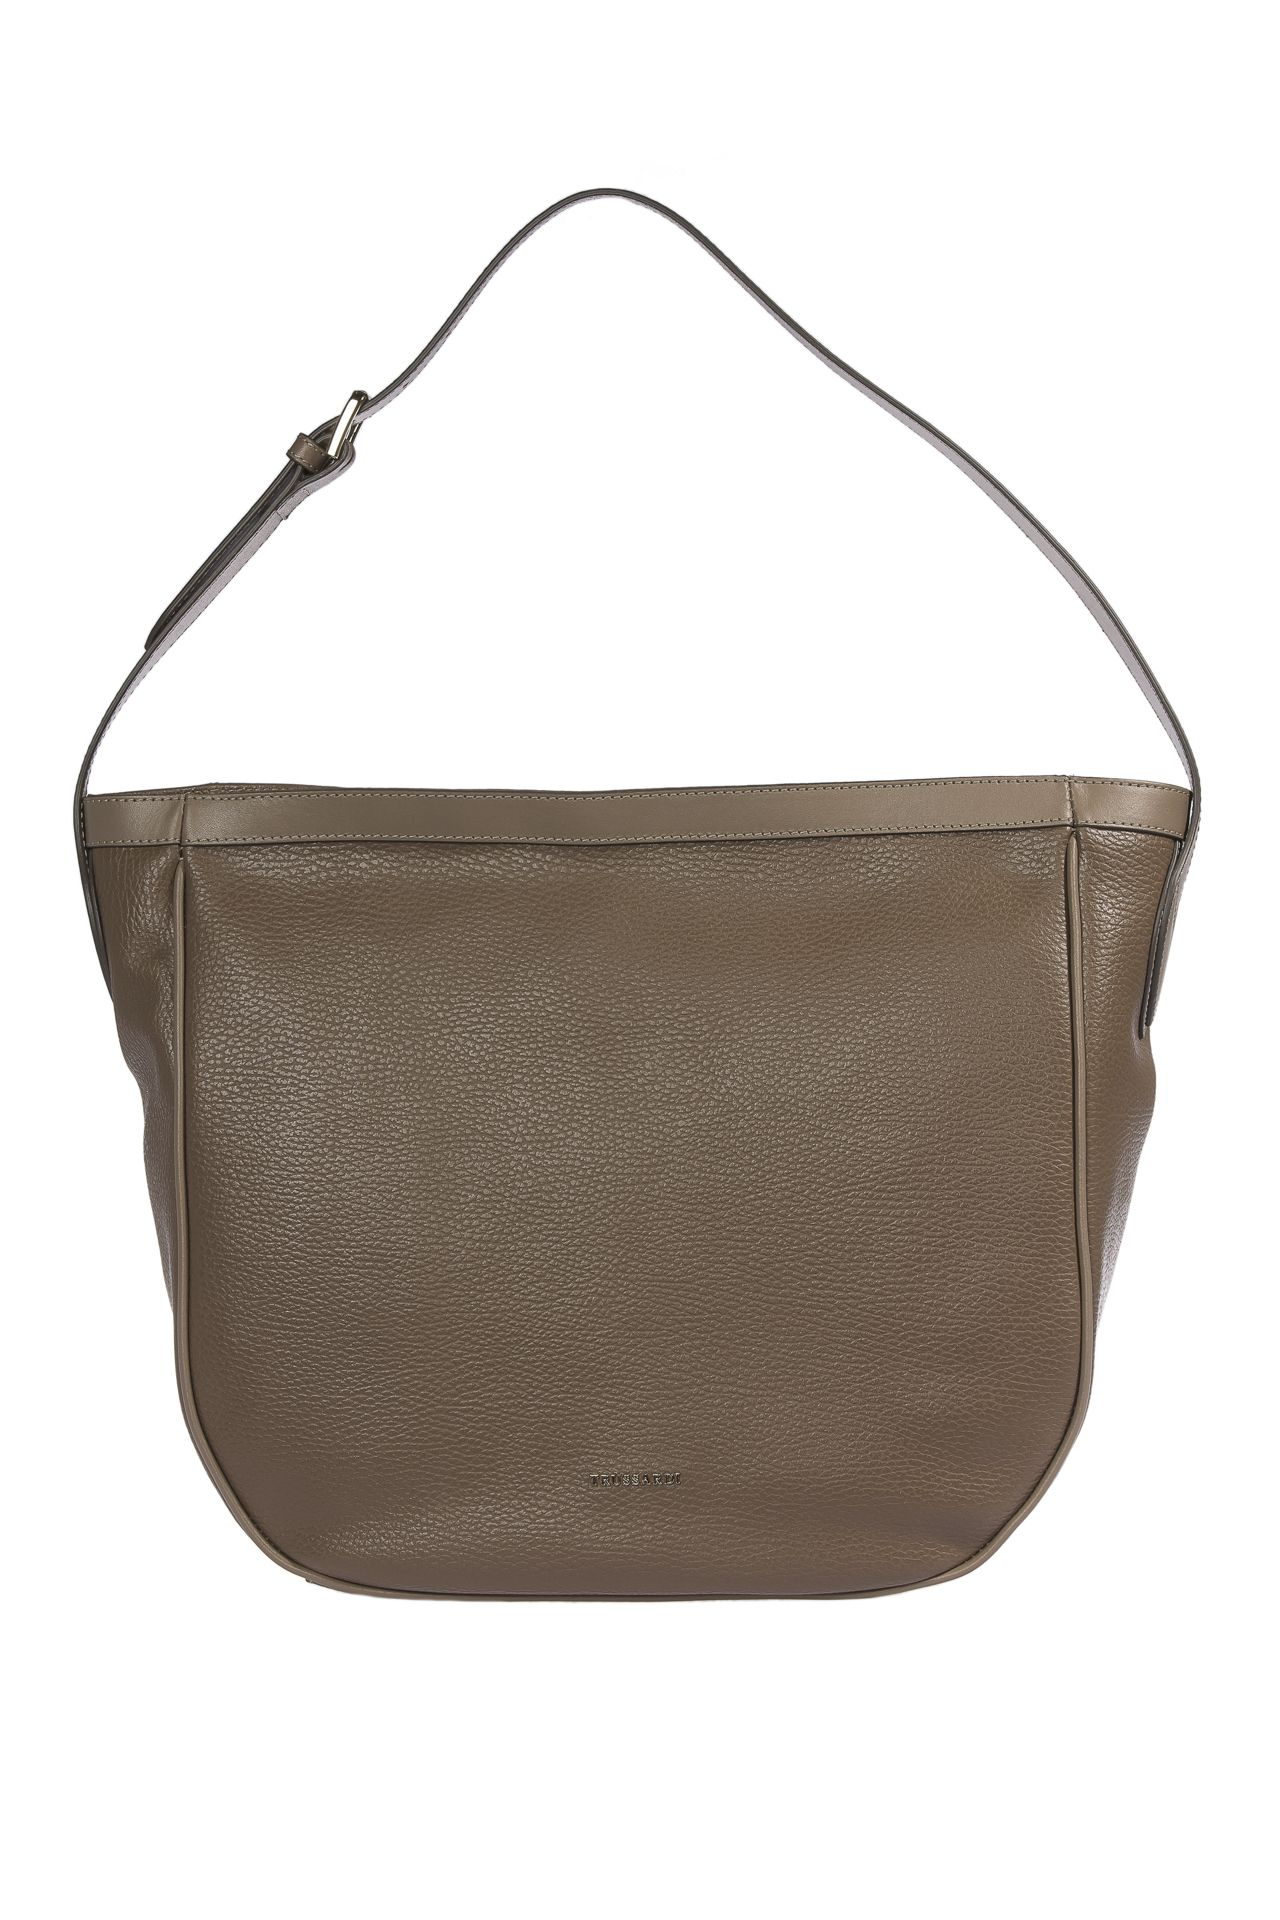 Trussardi Women's Shoulder Bag Beige 1DB517_04Beige